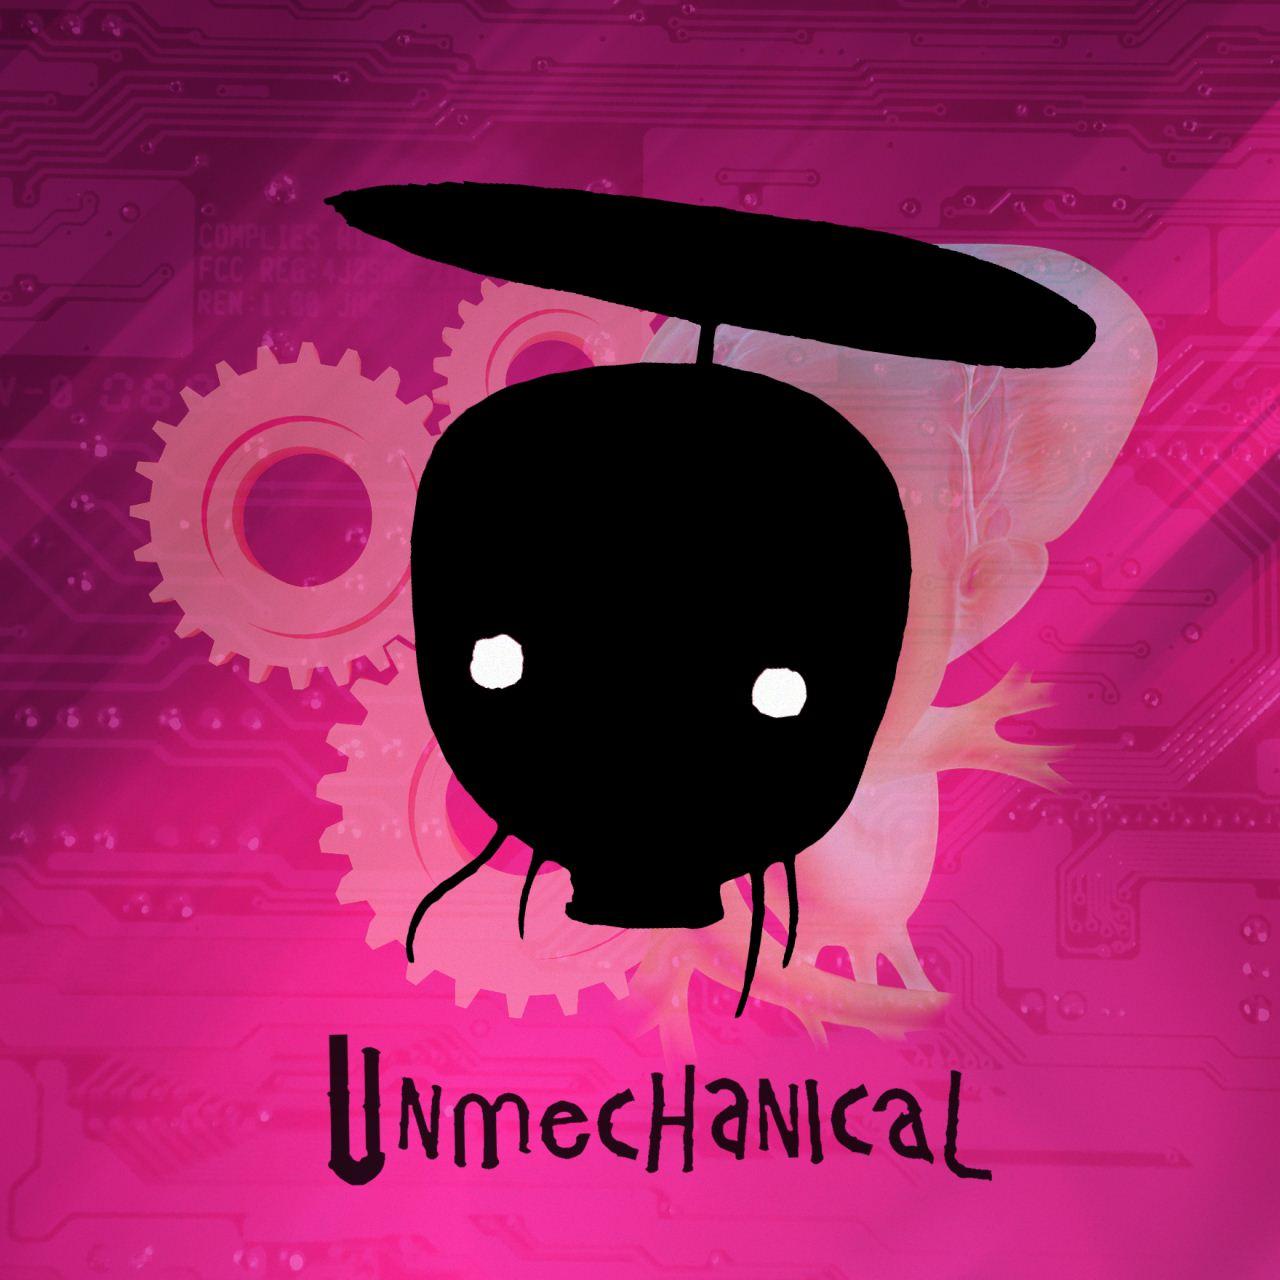 Unmechanical soundtrack